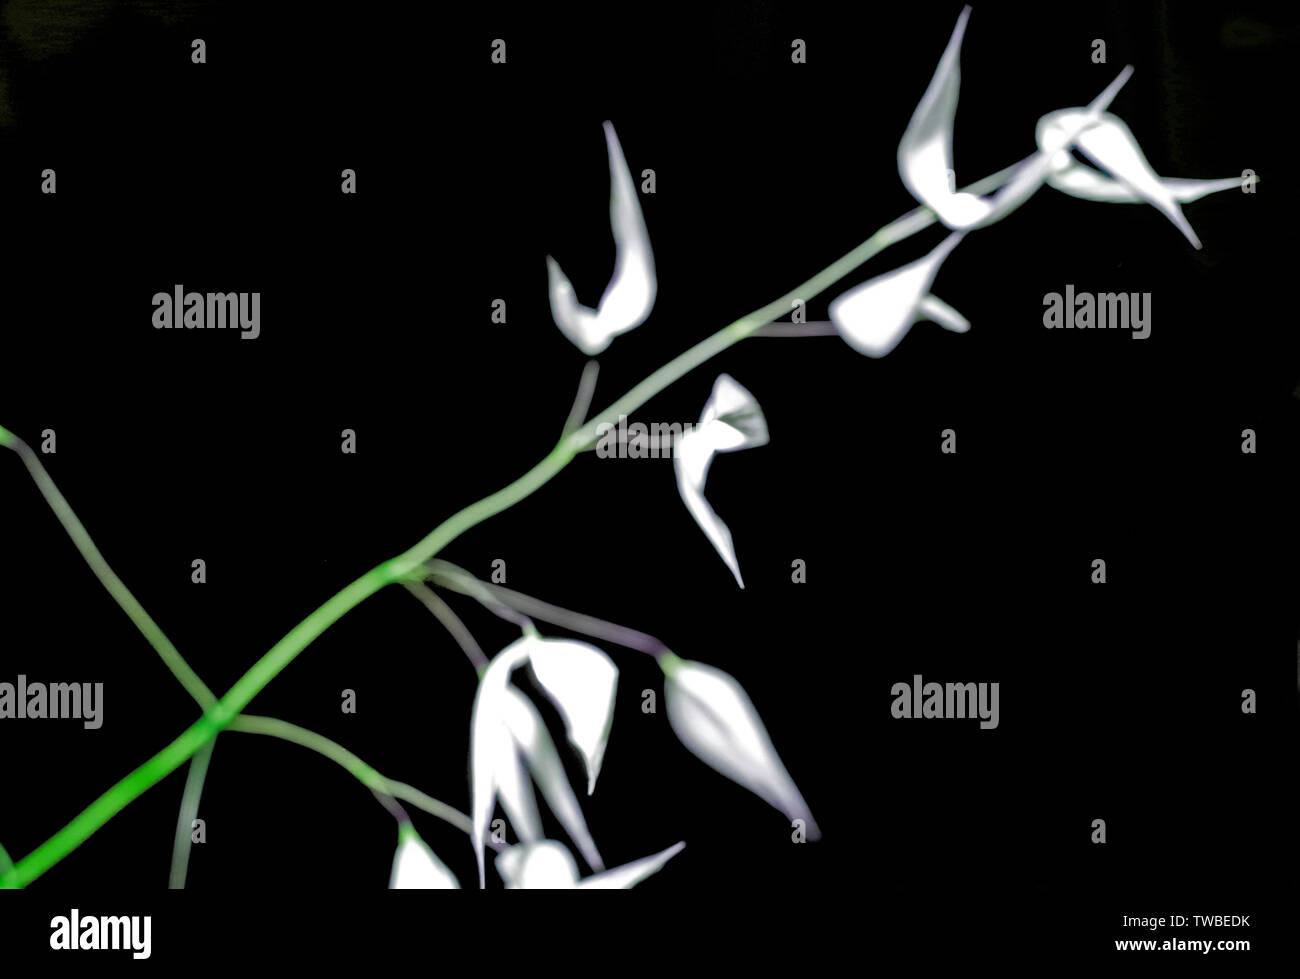 Wild oat (Avena fatua)  dry close-up on black background (digital elaboration) Stock Photo